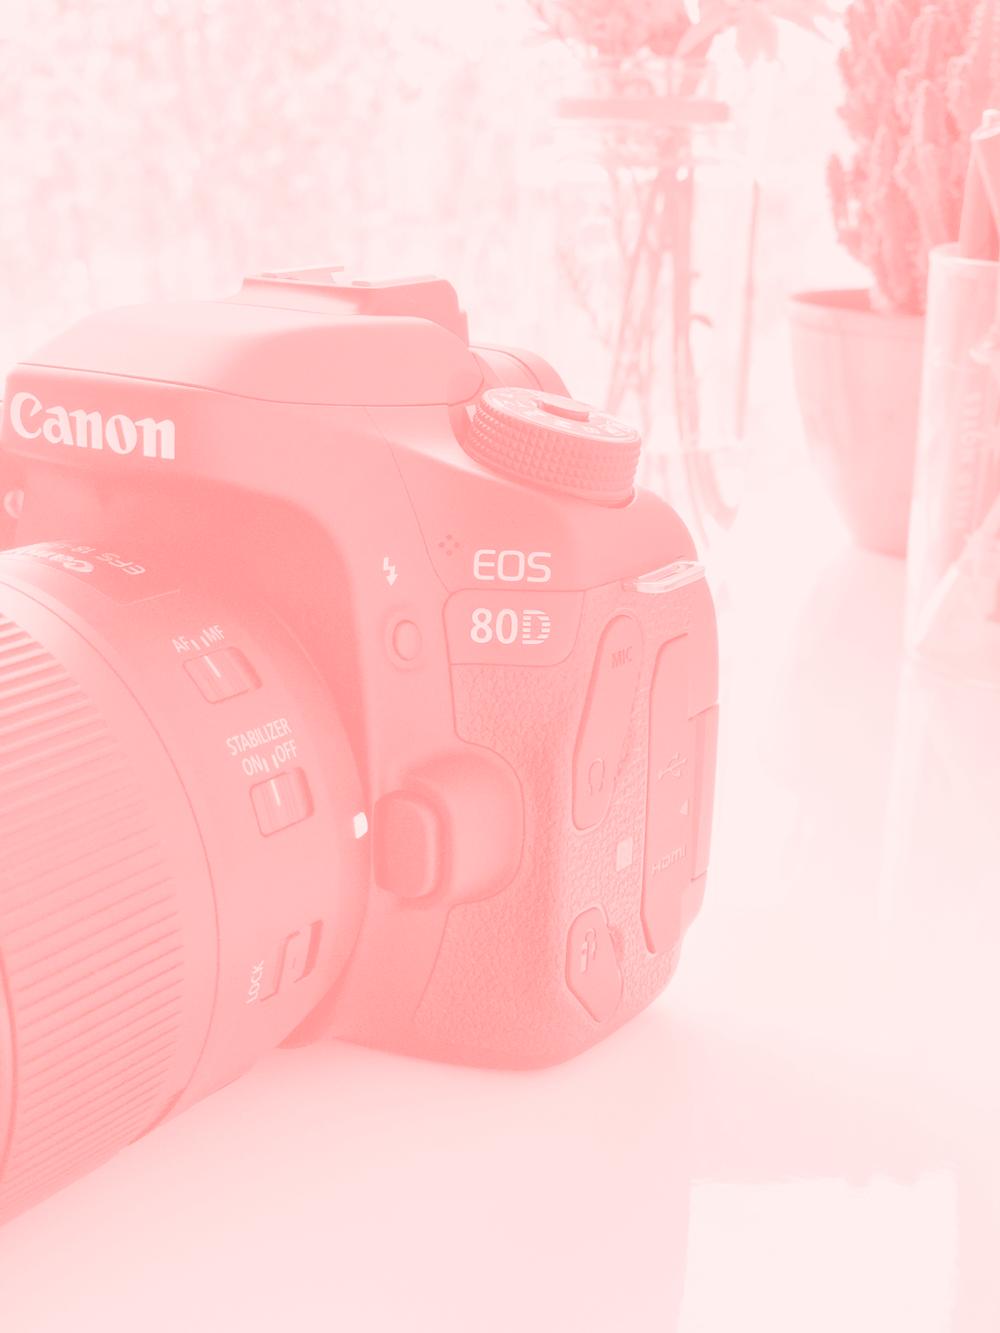 camera-min.png